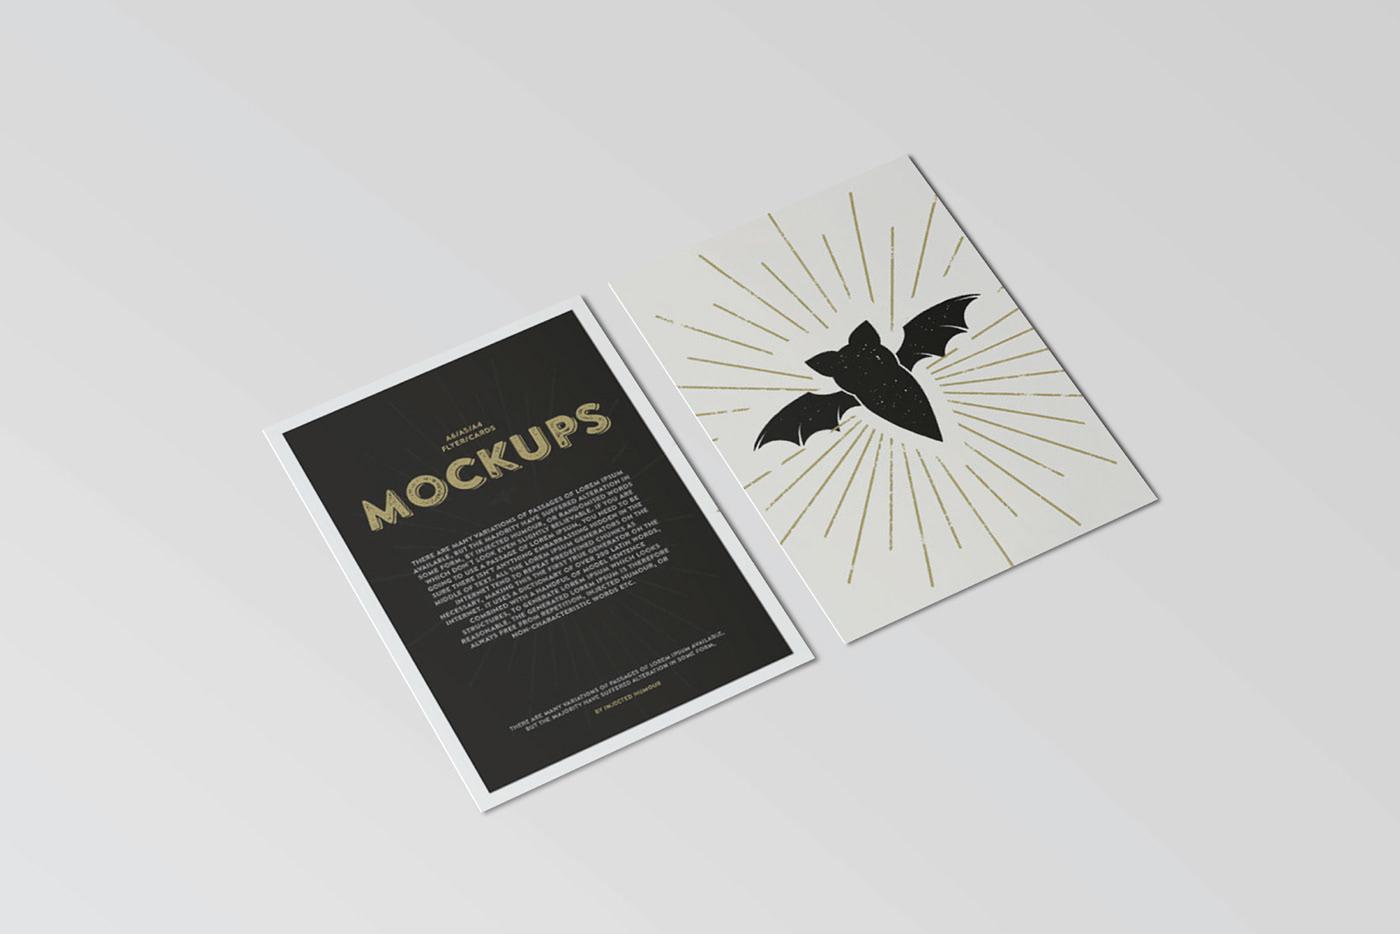 free free download freebie Mockup mockups brochure flyer postcard a6 a4